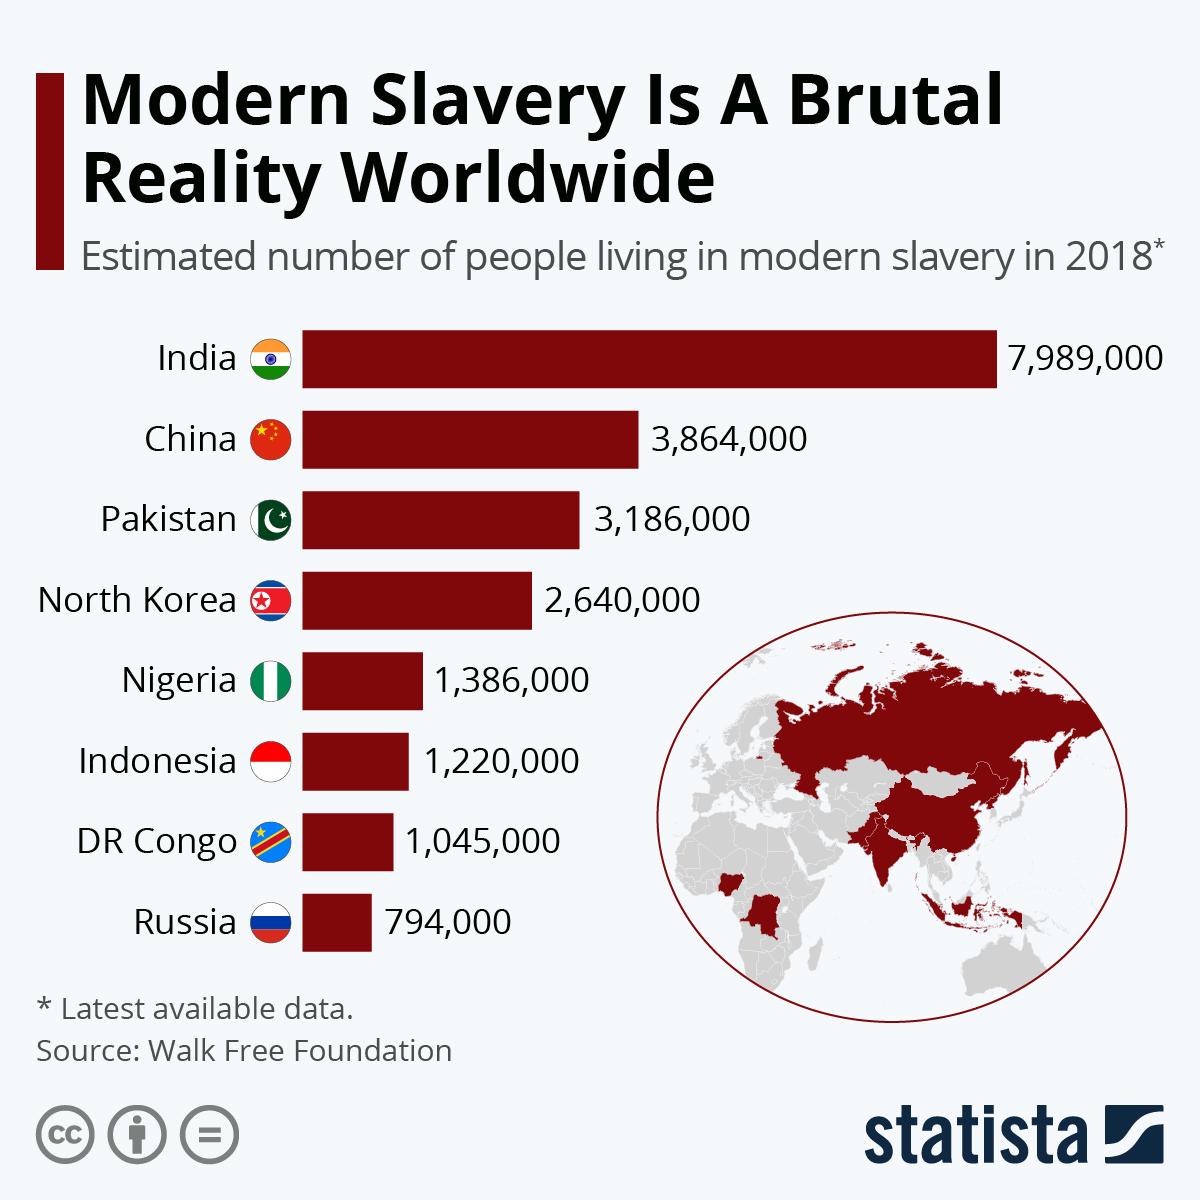 Discovery's Modern Slavery Statement